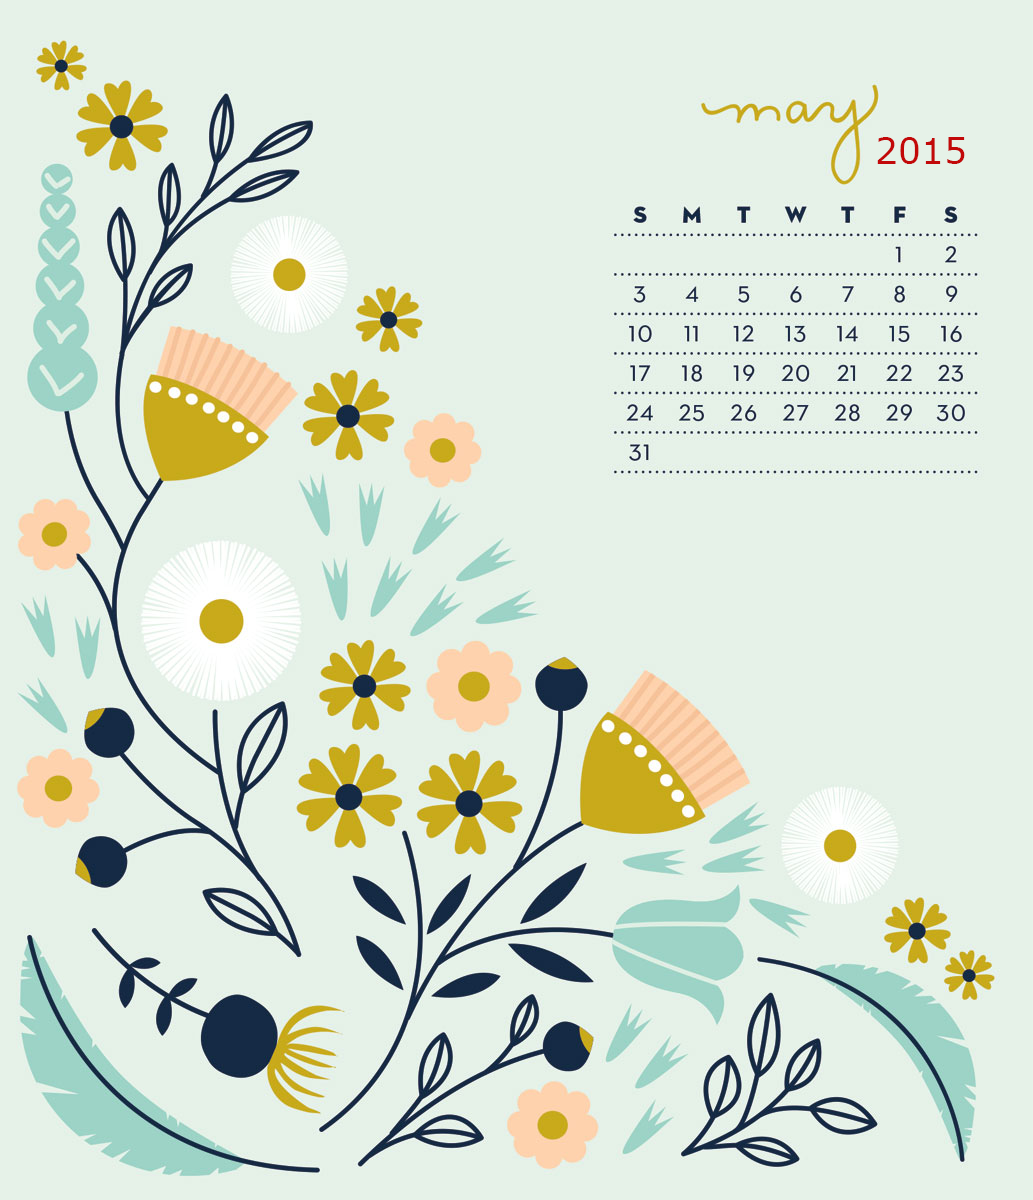 Desktop Wallpapers Calendar May 2015 1033x1200